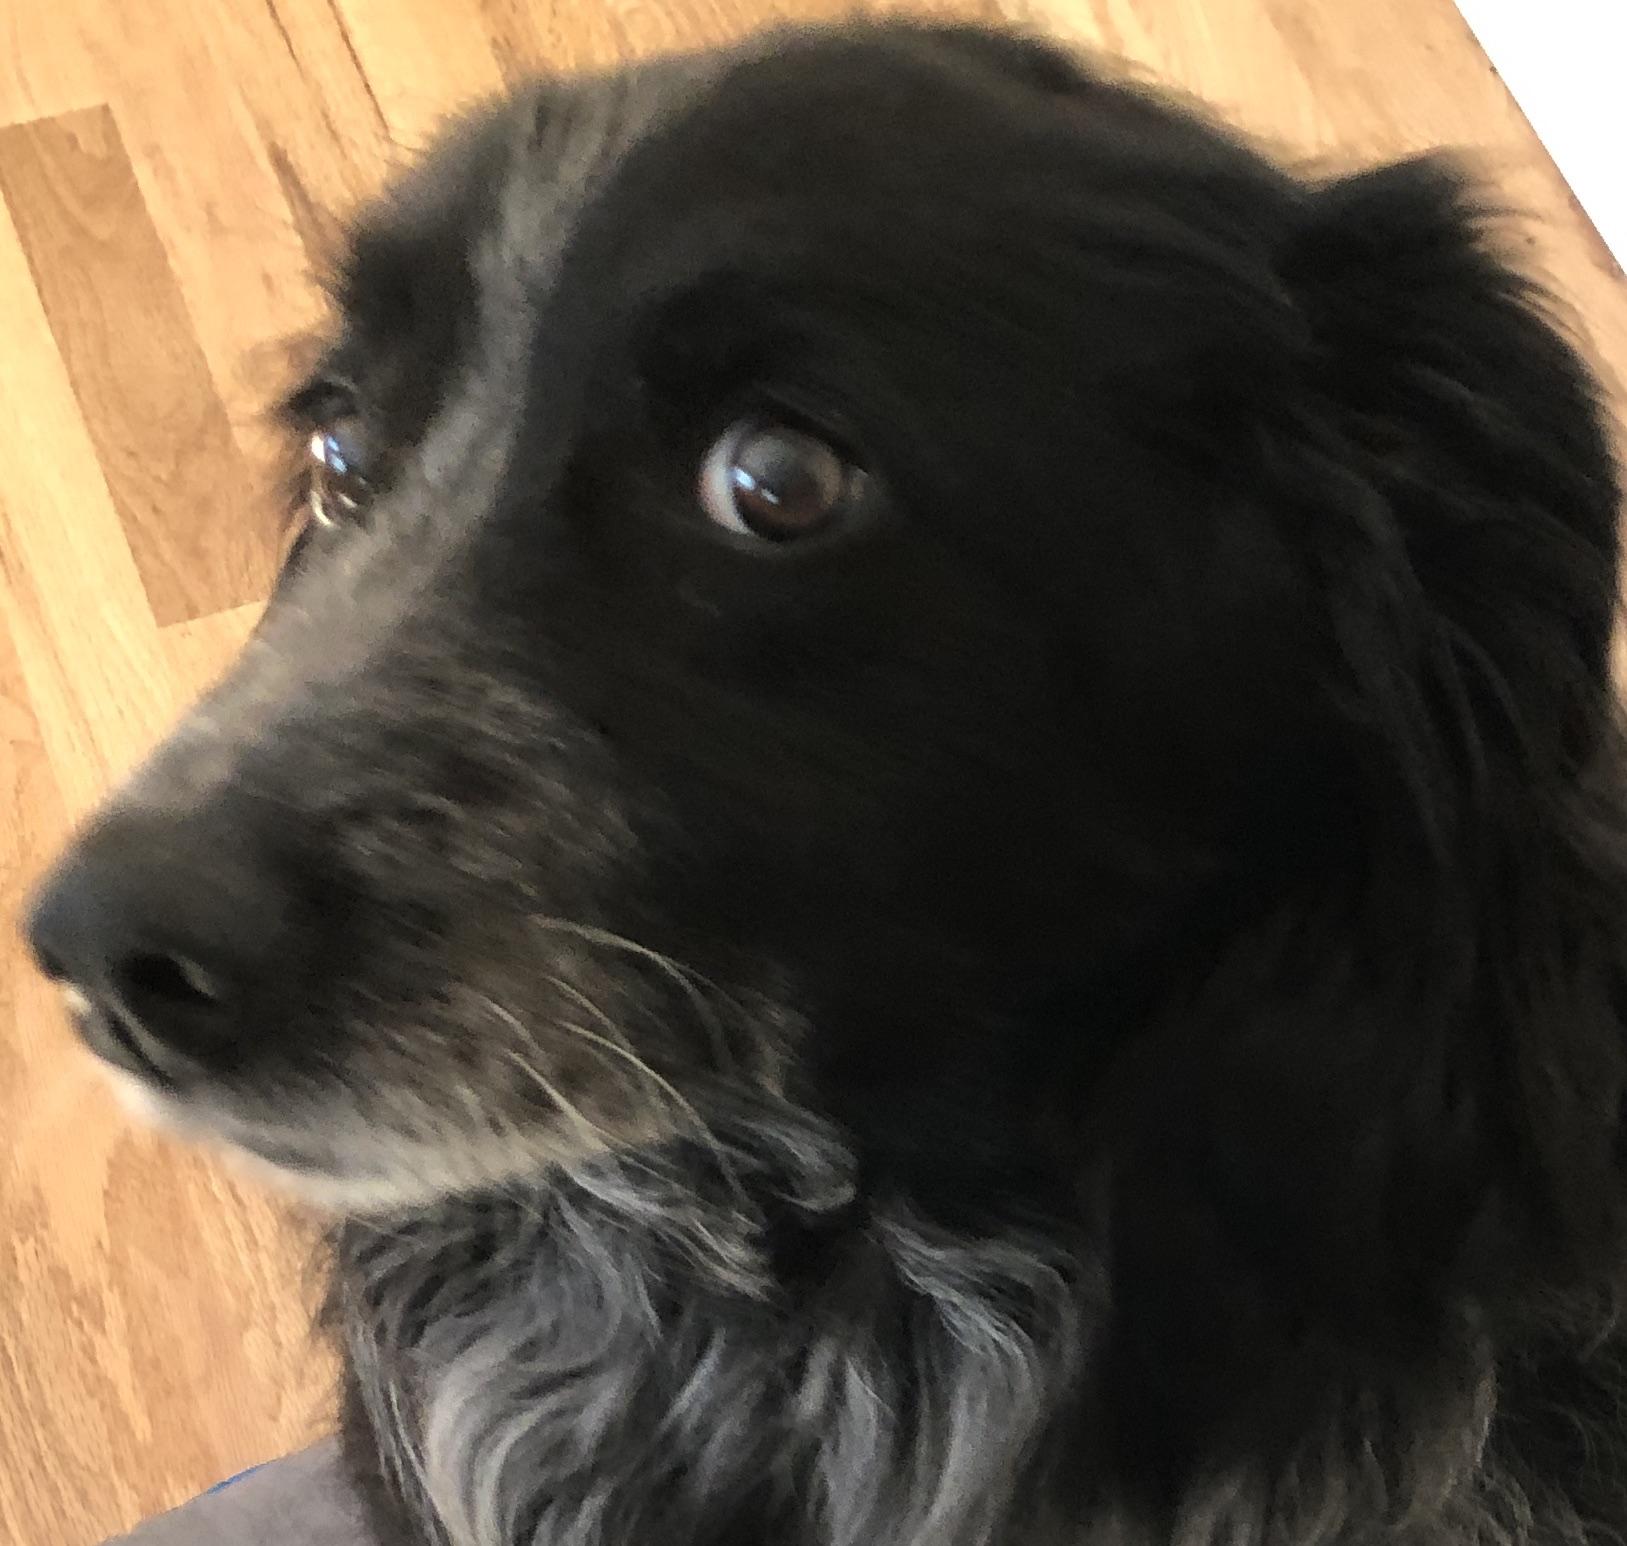 buddy watching reduced